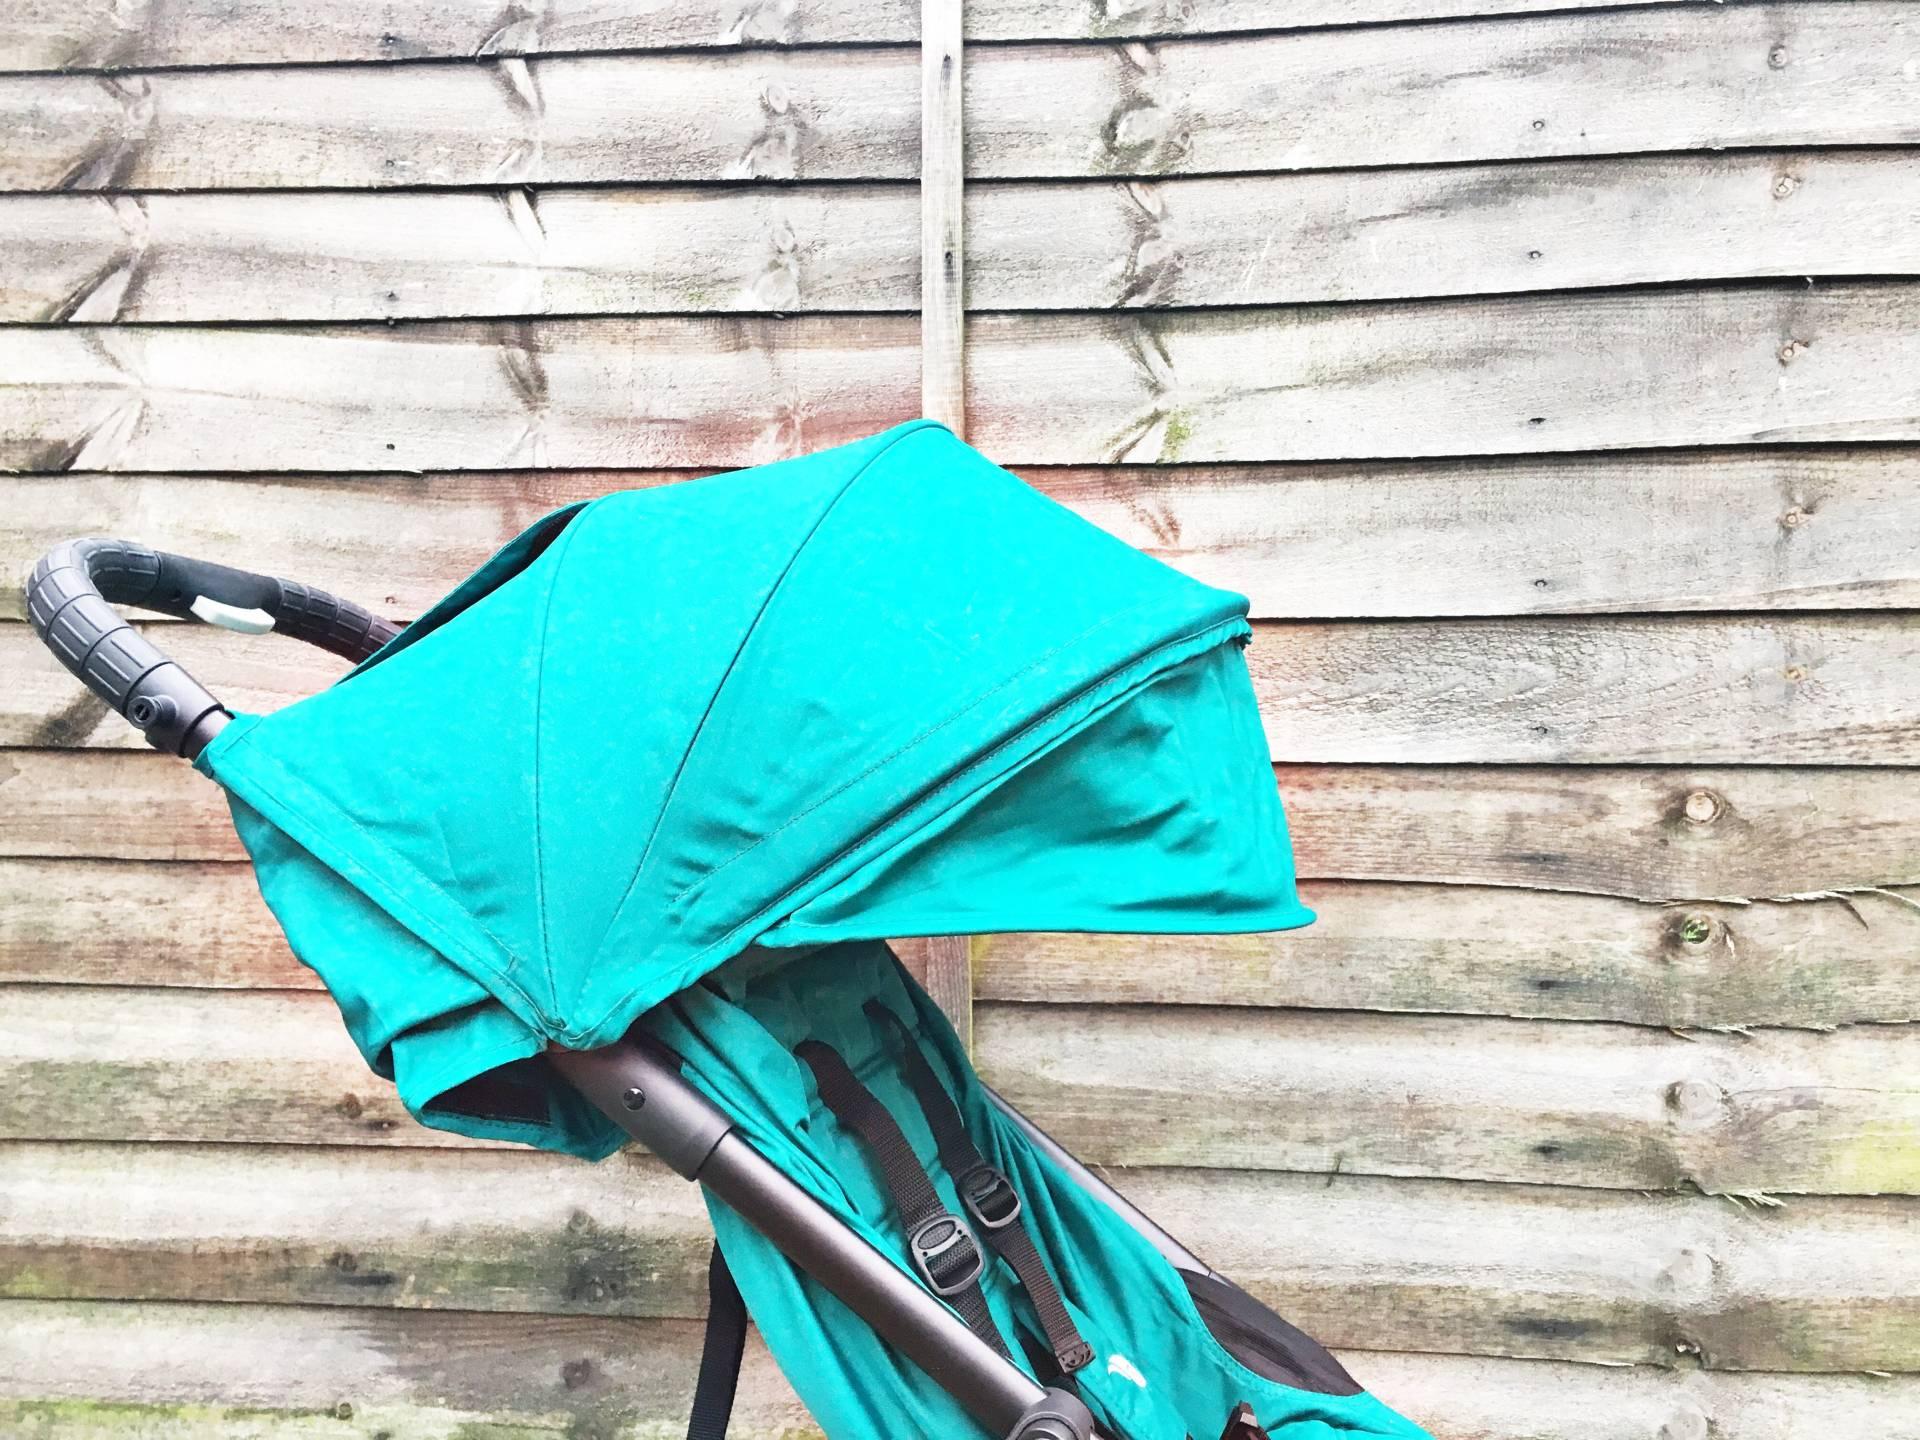 The Baby Jogger City Tour sun canopy spf50+